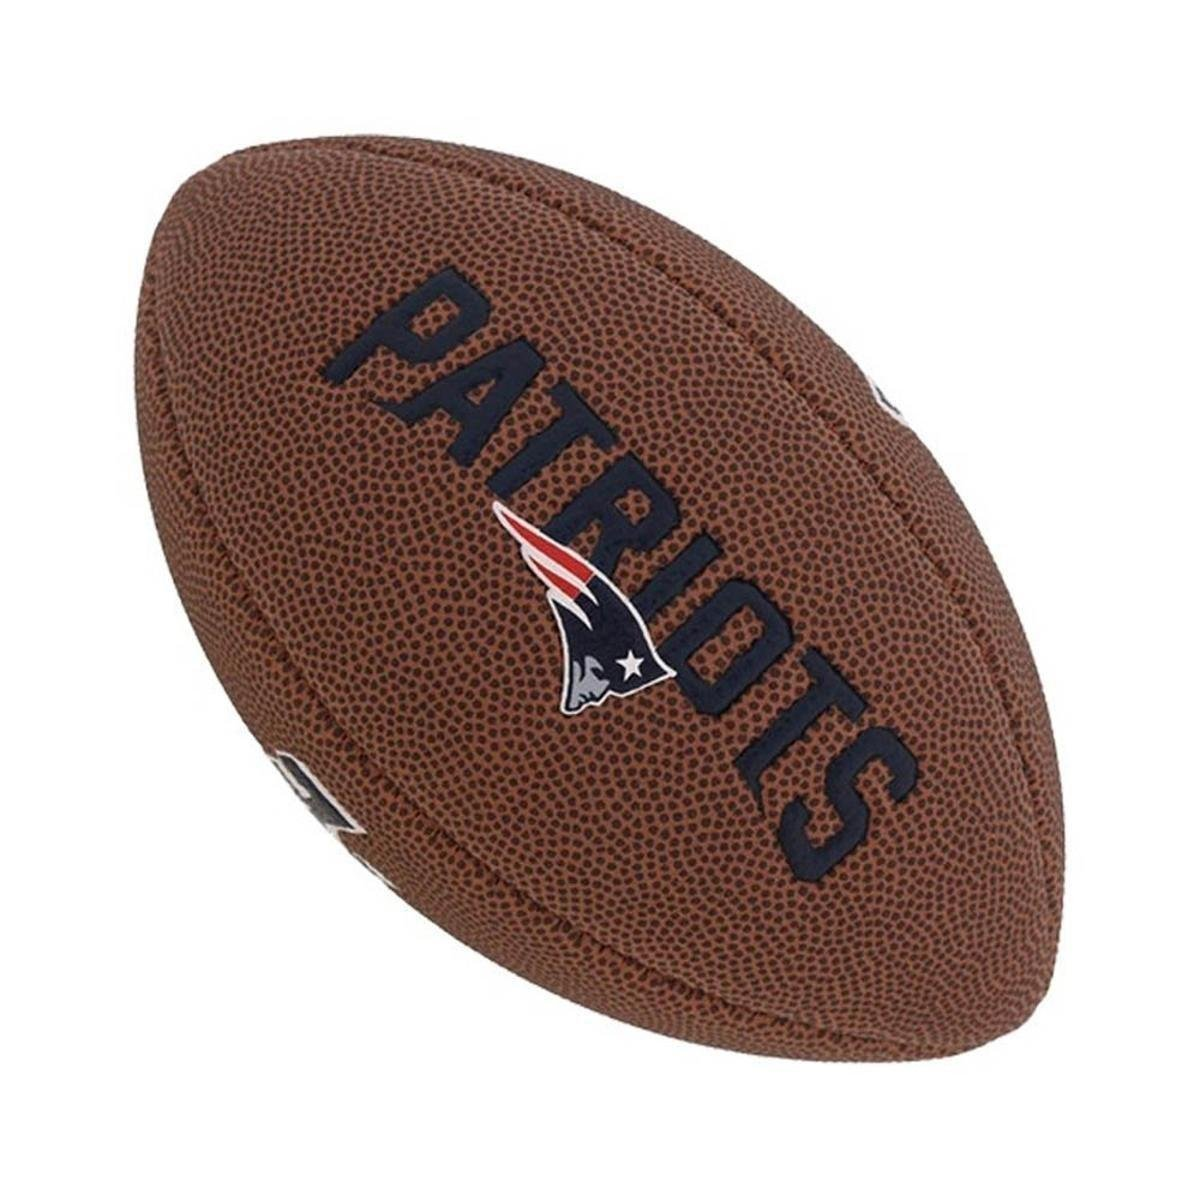 Bola Wilson Futebol Americano NFL Team Pittsburgh Steelers - Marrom ... 8d696f240bf25